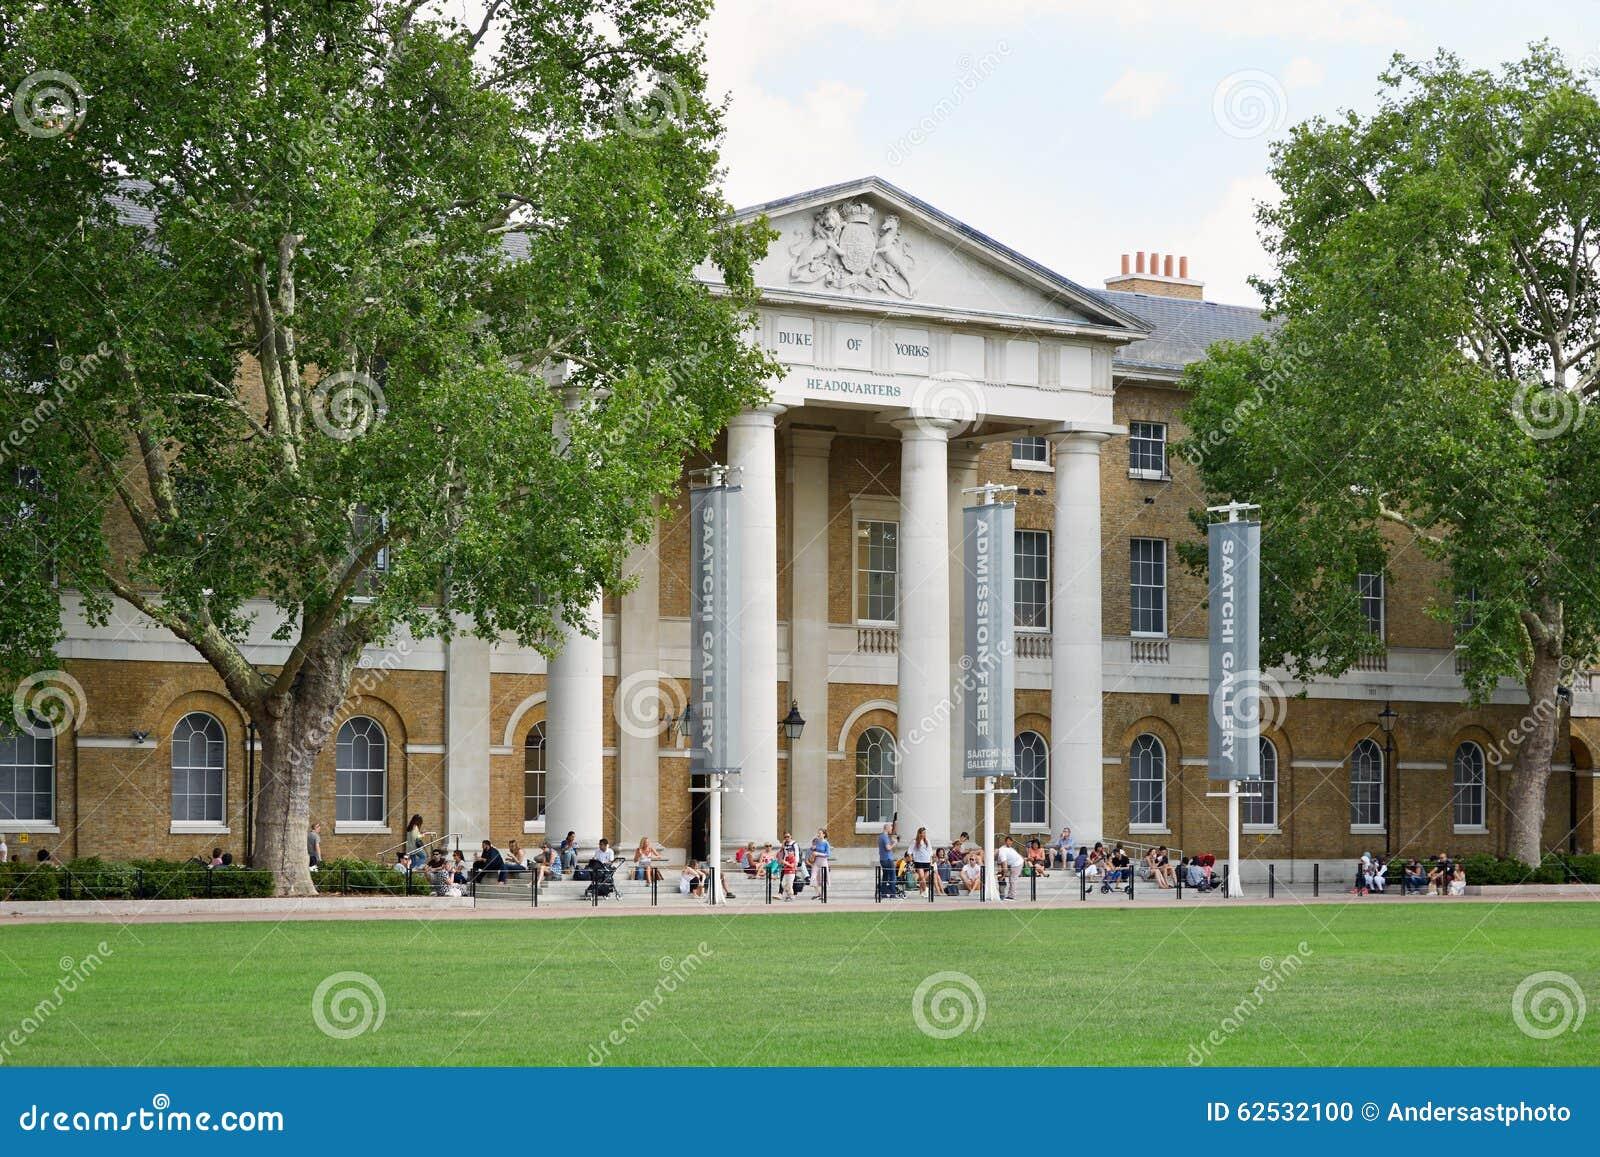 Saatchi画廊,著名美术画廊在伦敦